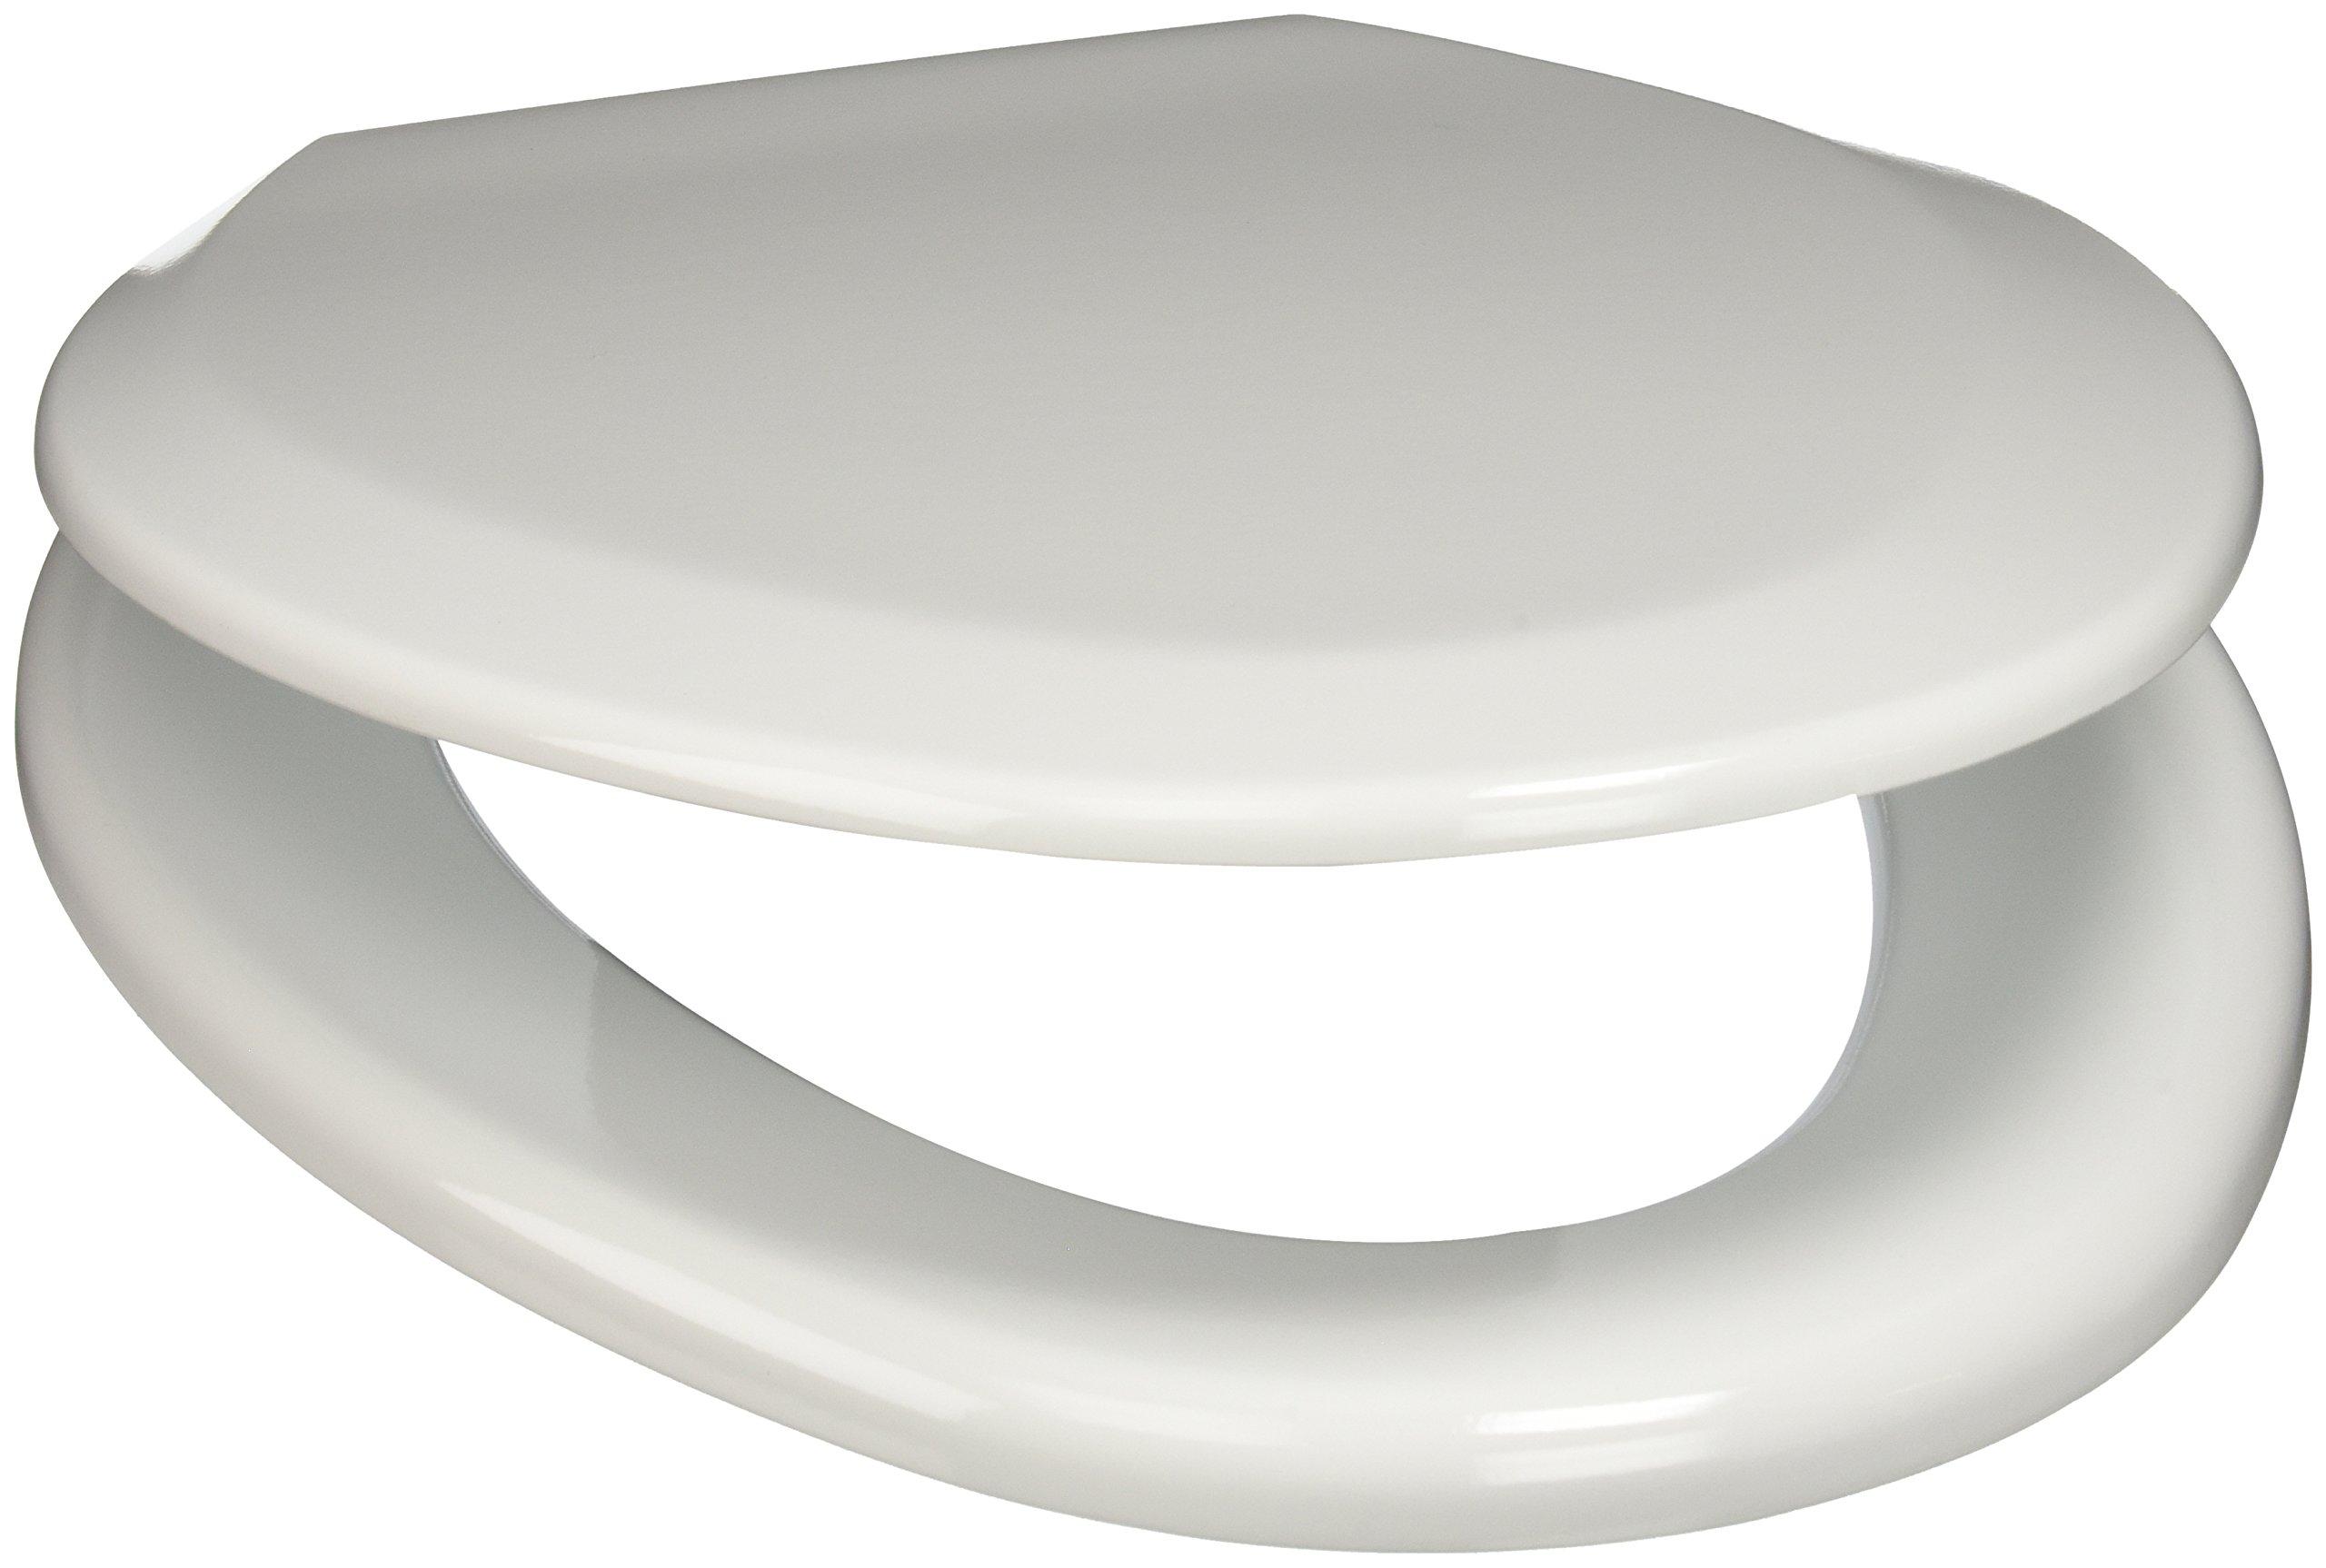 PlumbTech 124-04 Premium Molded Wood Elongated Toilet Seat with Adjustable Hinge, Cotton White